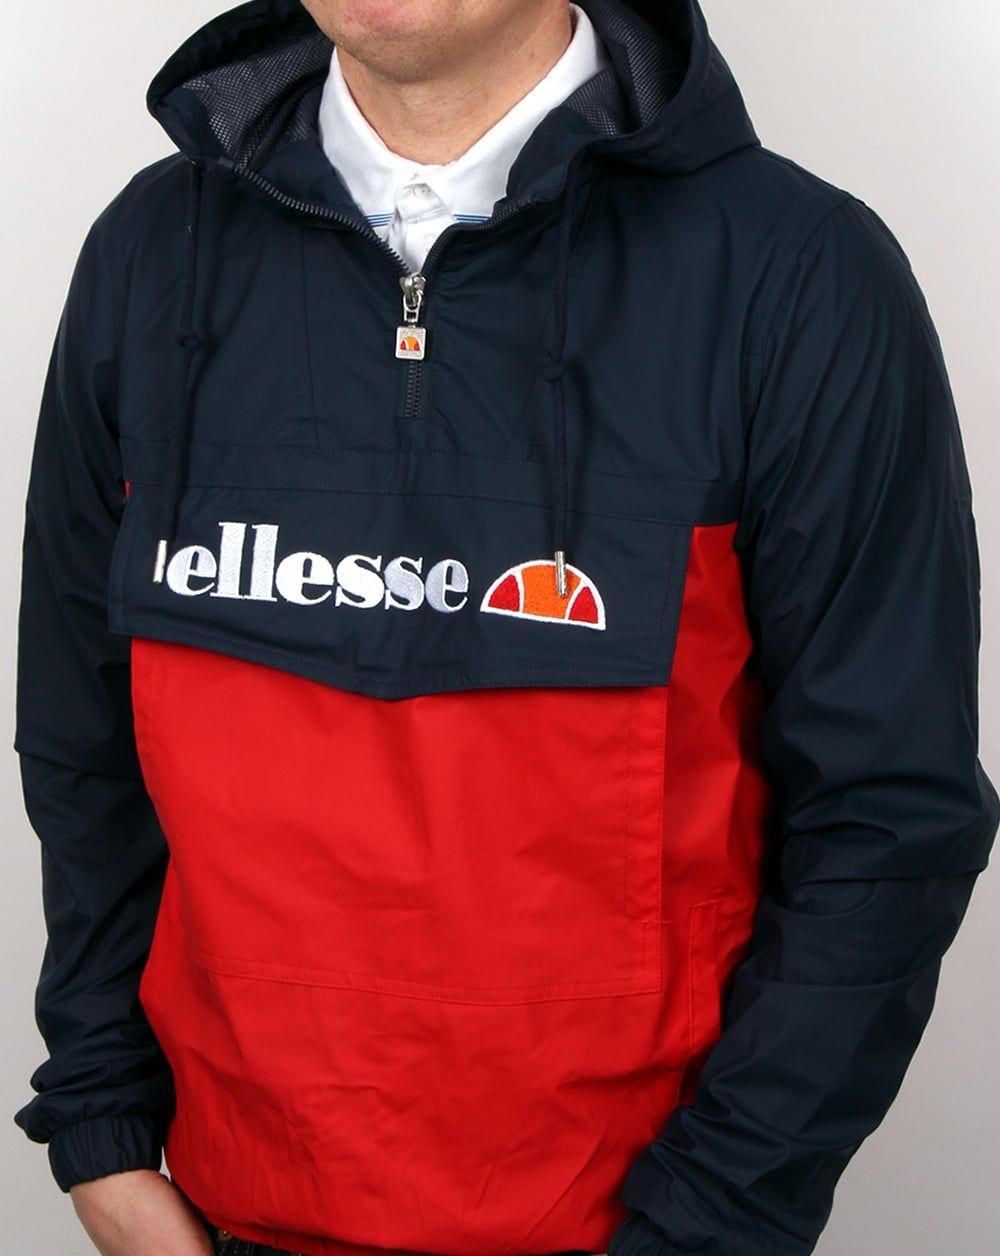 Ellesse Mont Brava Quarter Zip Jacket Navy Red  3f7be56ad6a